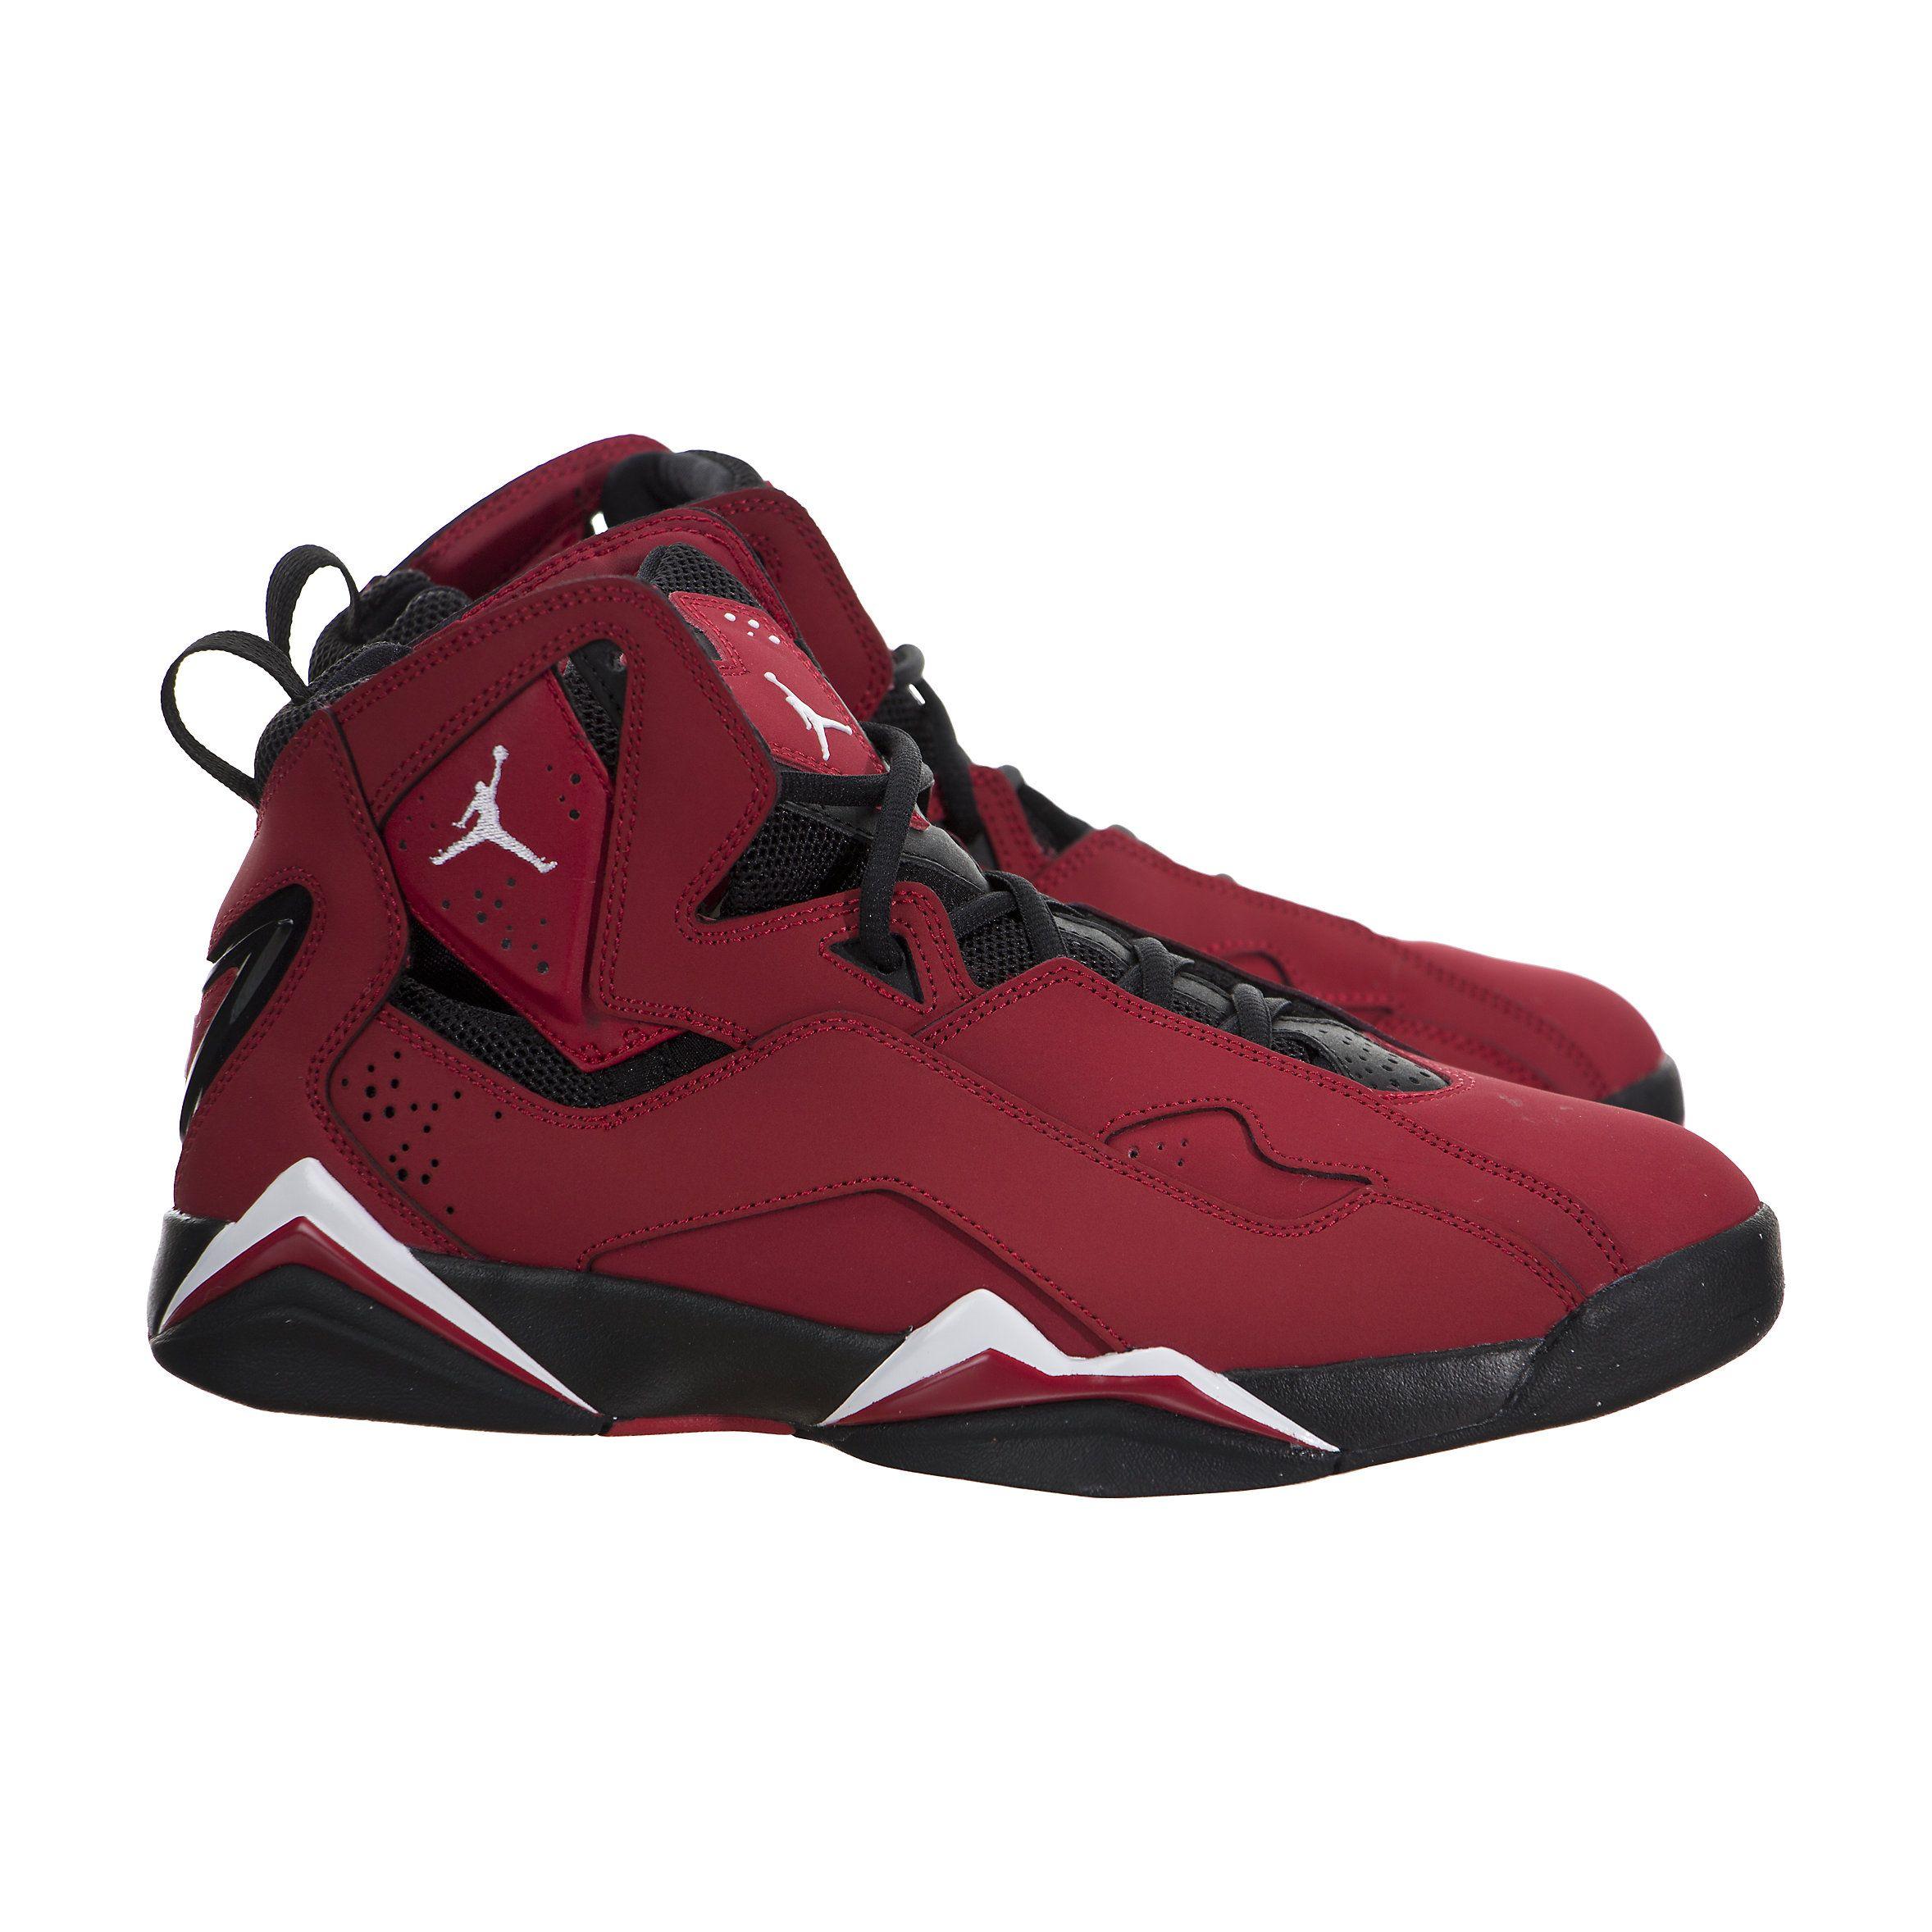 Air Jordan True Flight | Adidas shoes women, New jordans shoes ...